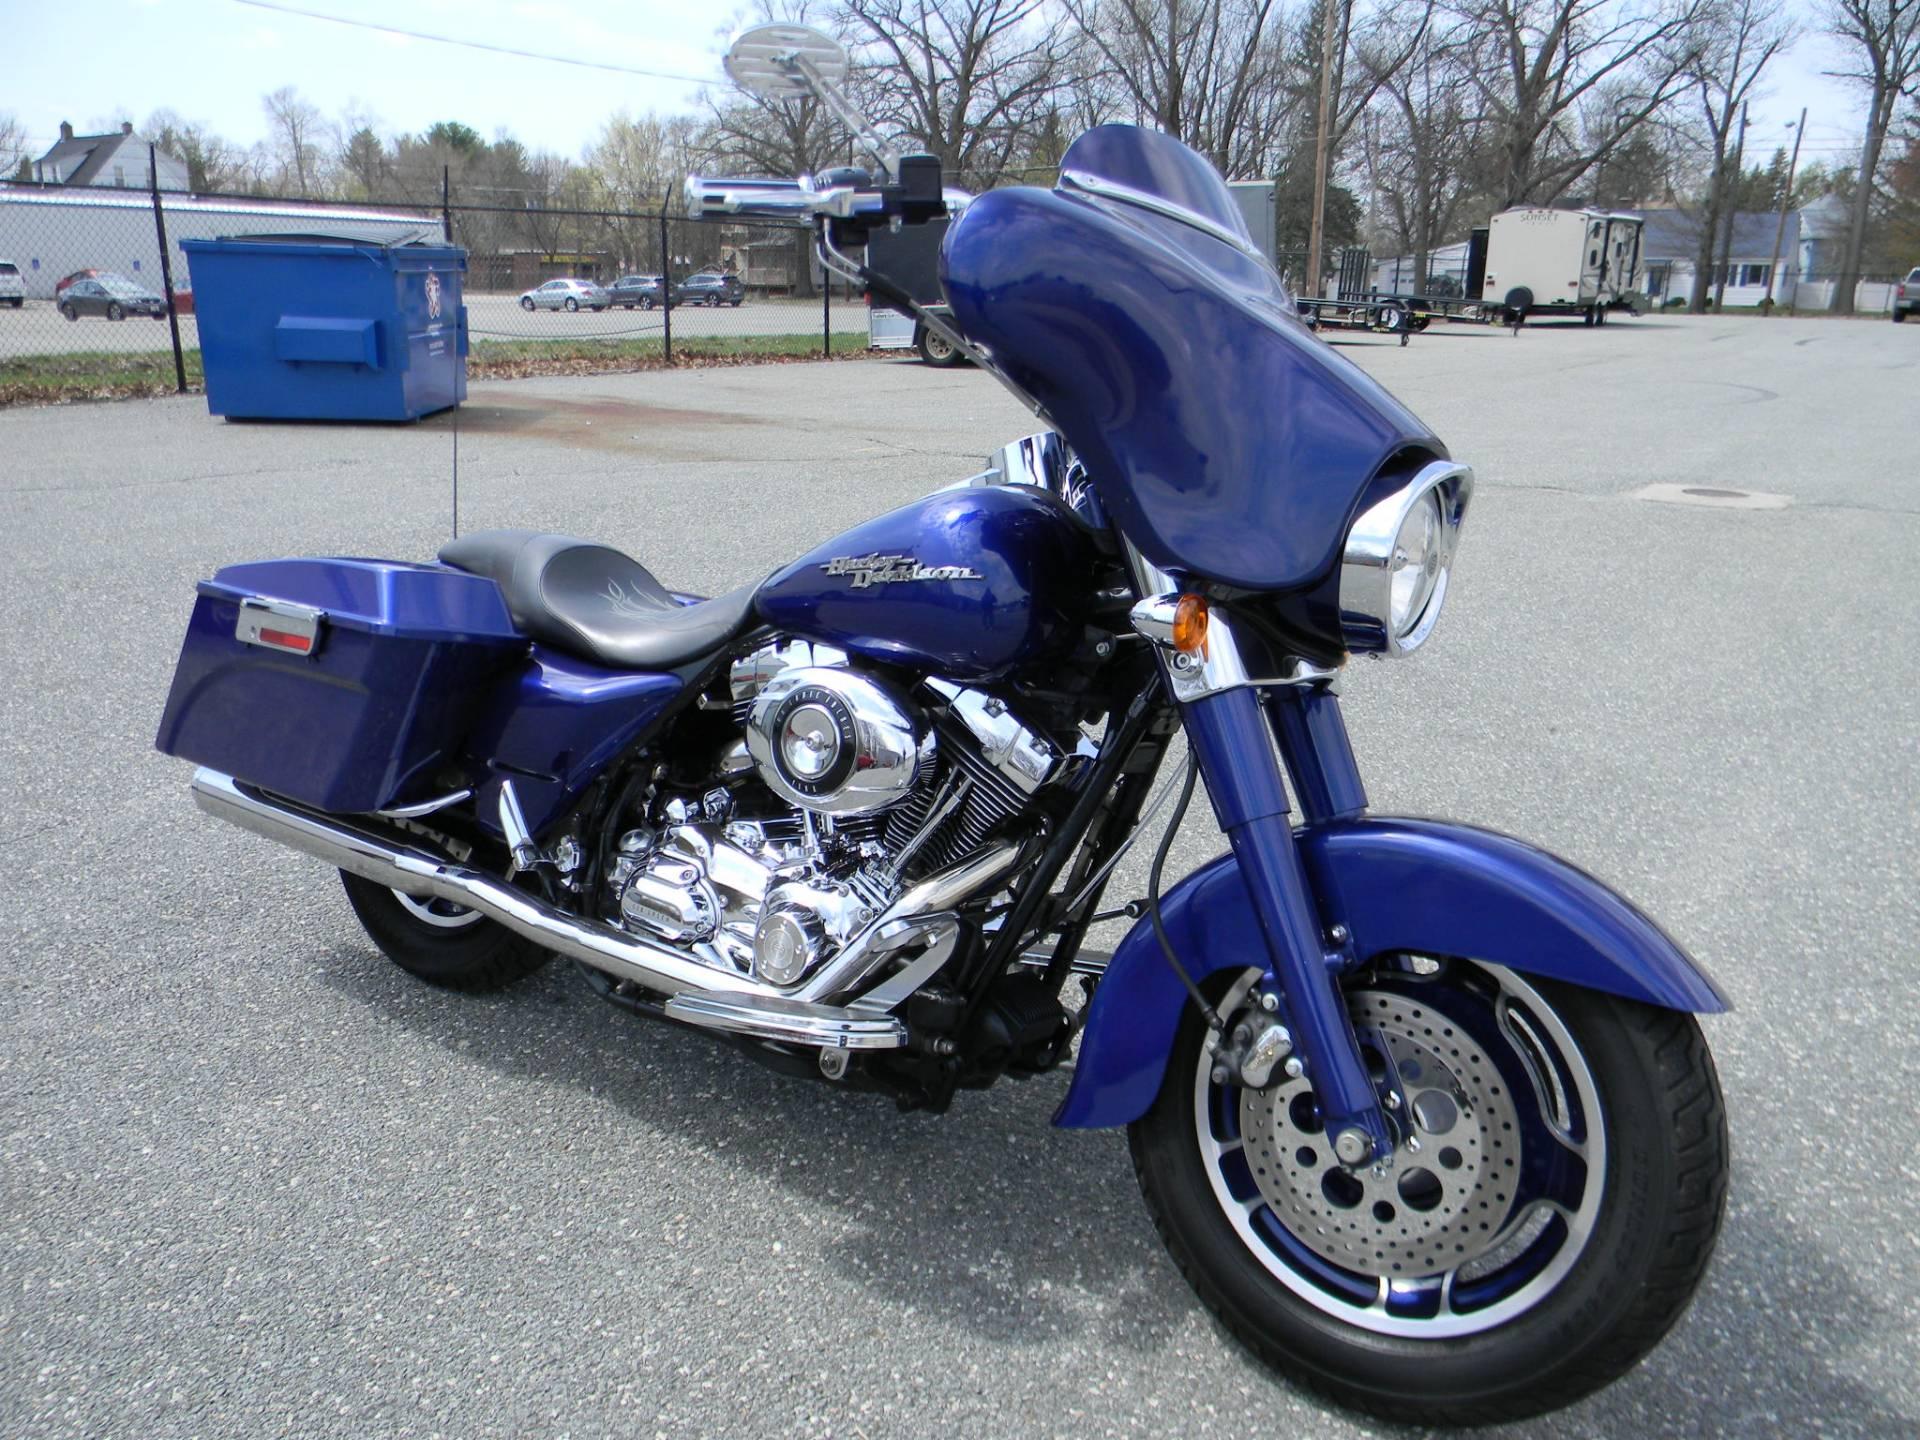 2007 Harley-Davidson Street Glide™ in Springfield, Massachusetts